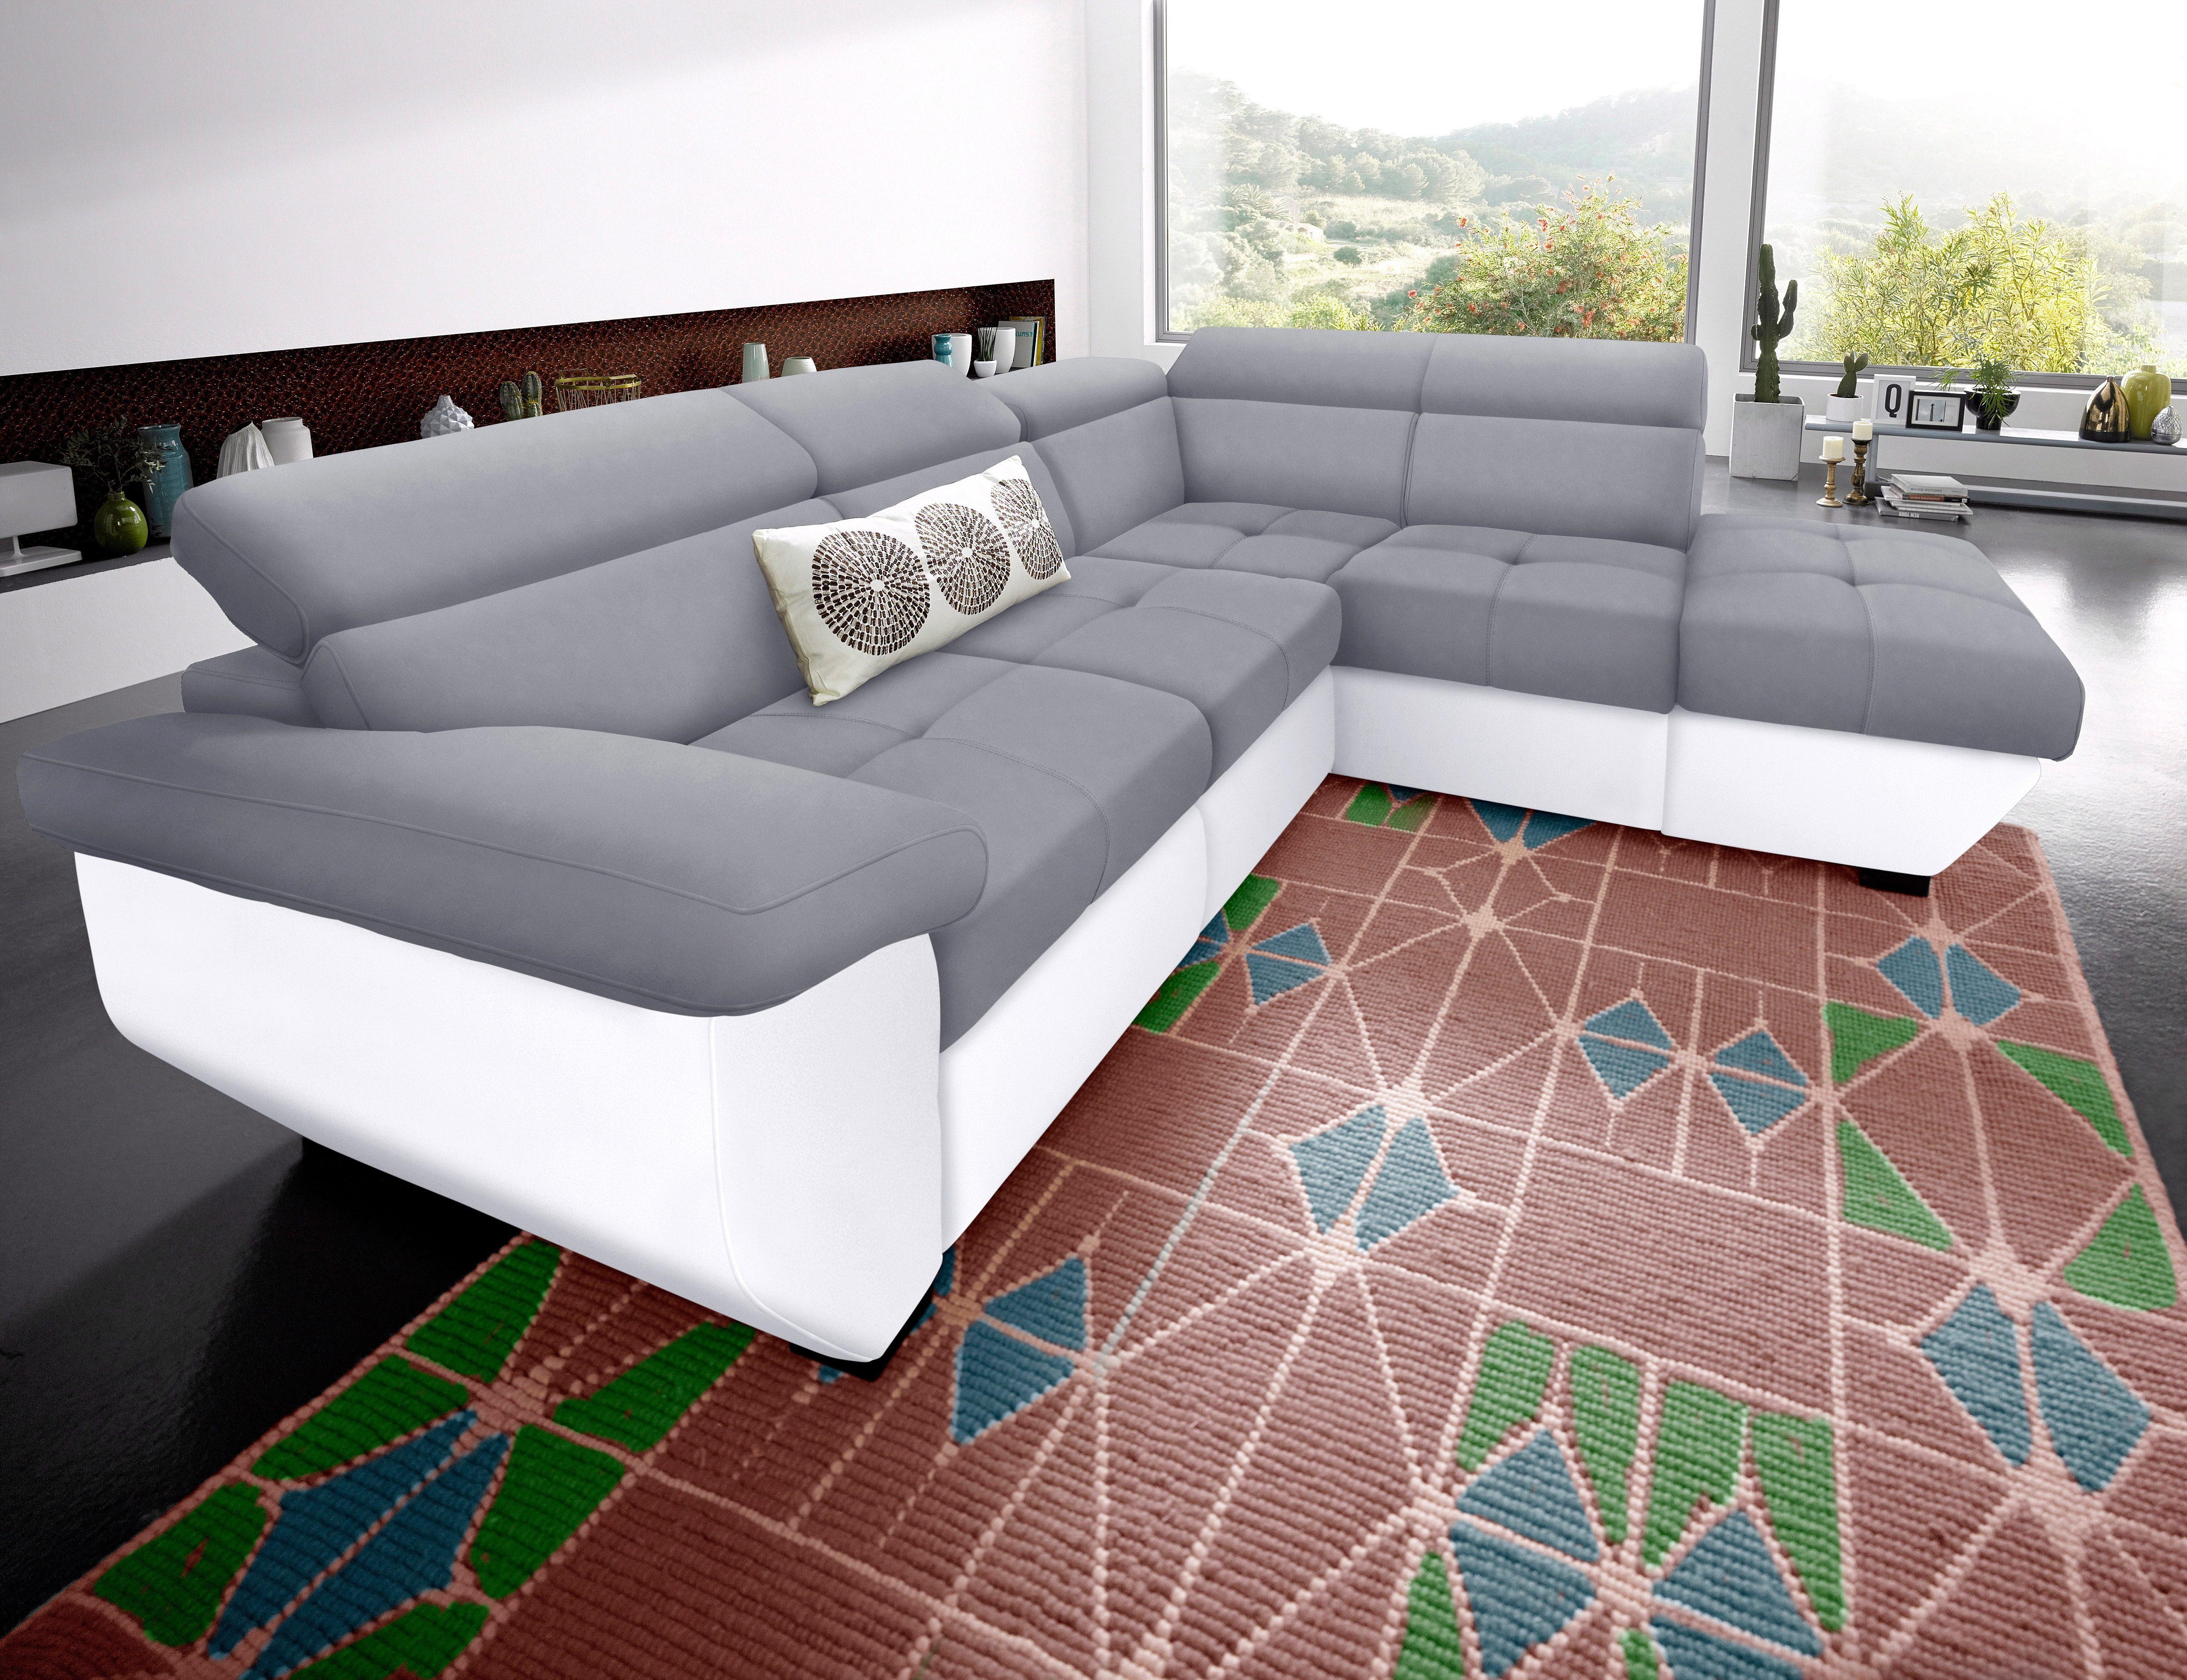 50 sparen cotta polsterecke wahlweise mit bettfunktion. Black Bedroom Furniture Sets. Home Design Ideas